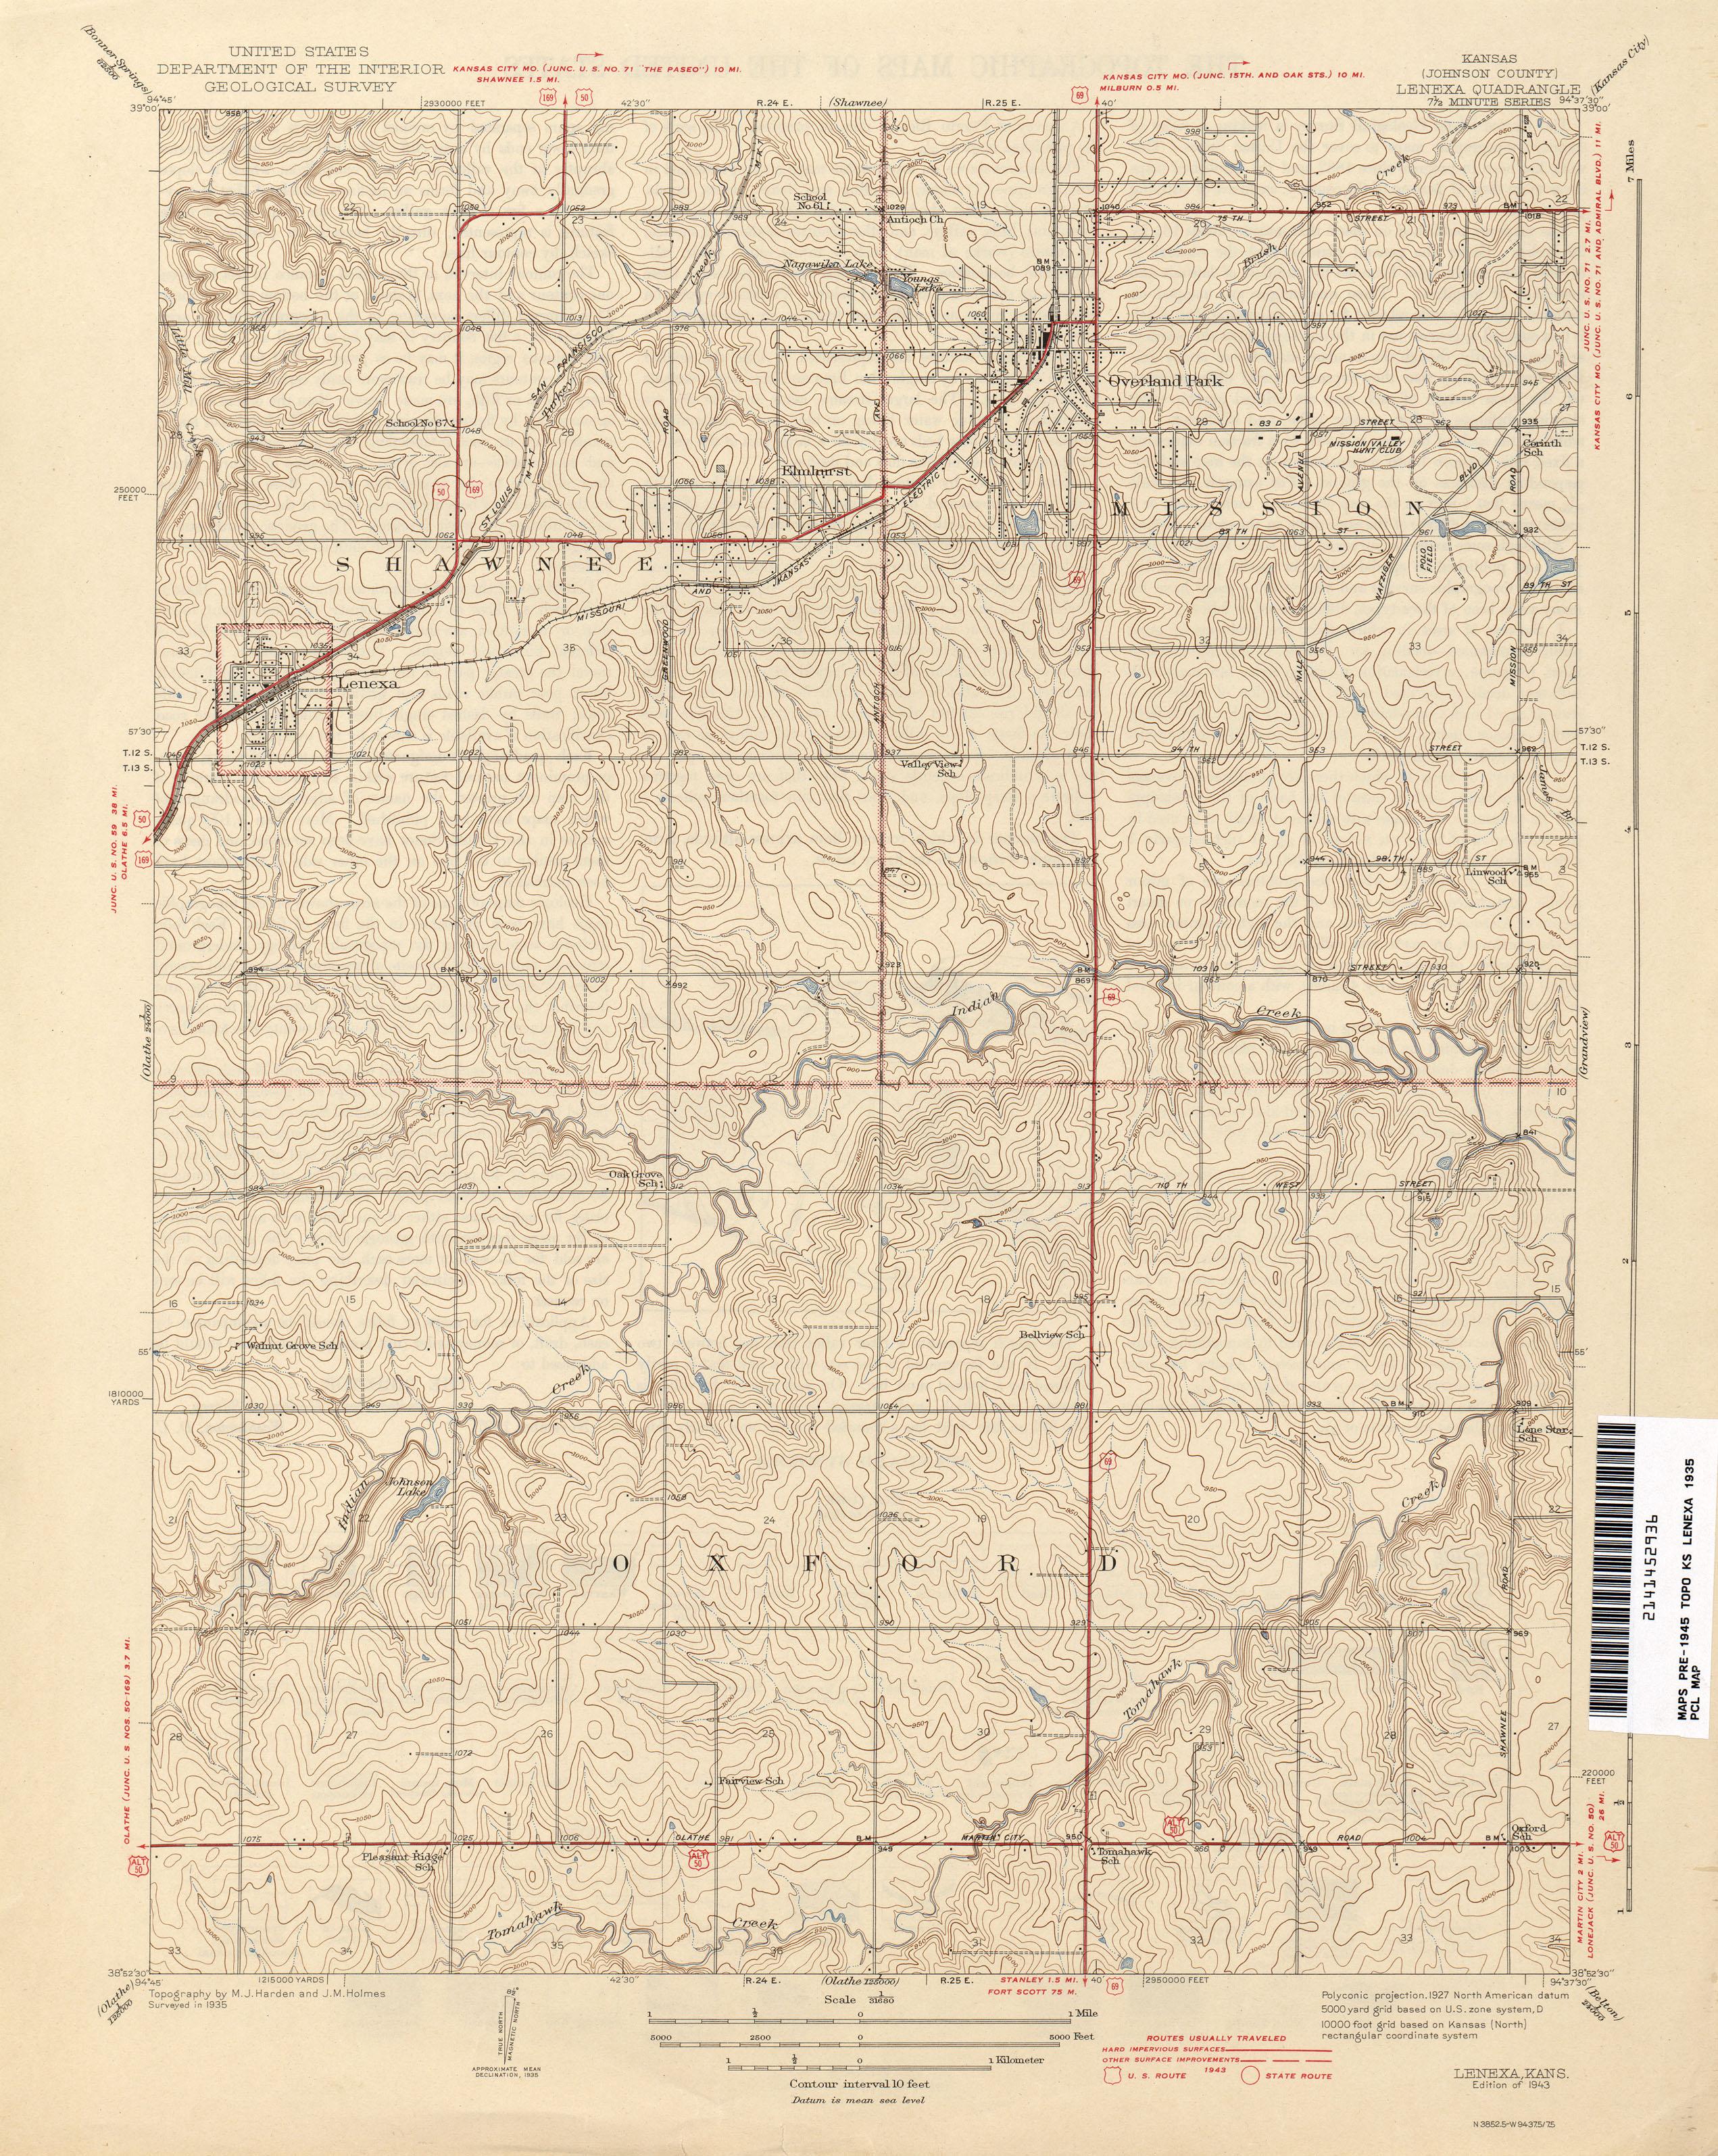 Lenexa Kansas Map.Kansas Historical Topographic Maps Perry Castaneda Map Collection